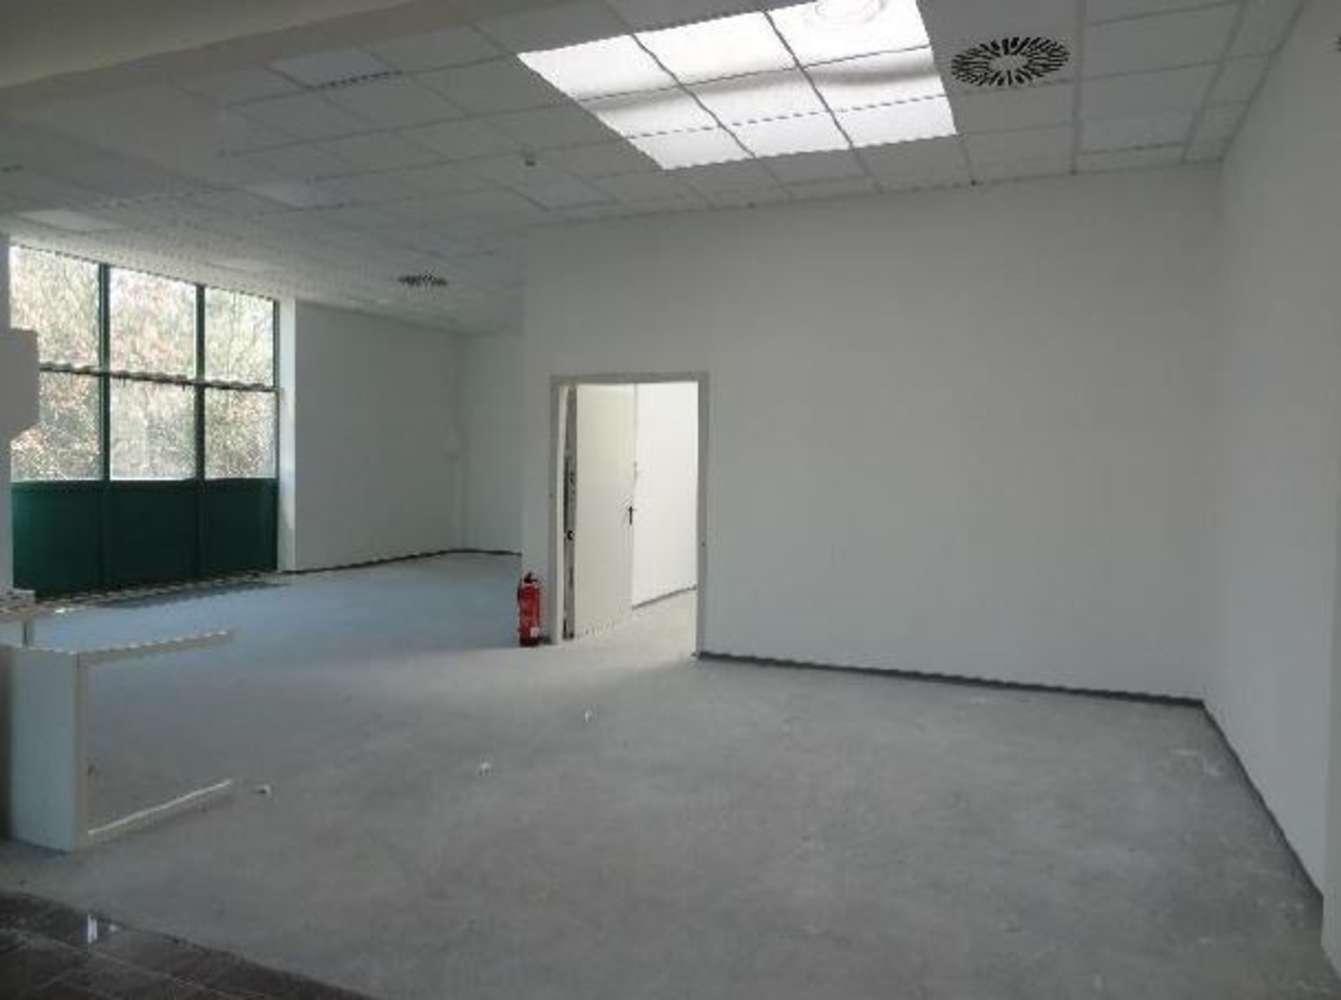 Büros Erlangen, 91058 - Büro - Erlangen, Tennenlohe - M1623 - 10605624